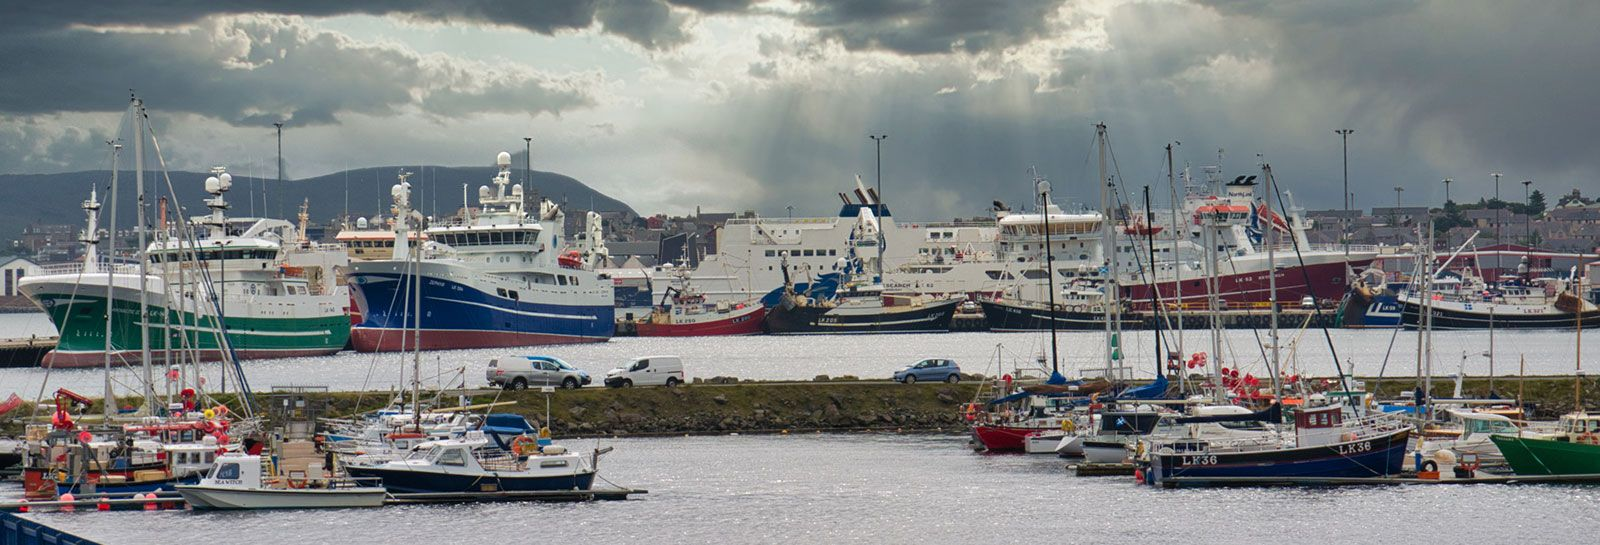 Lerwick Harbour in Shetland banner image